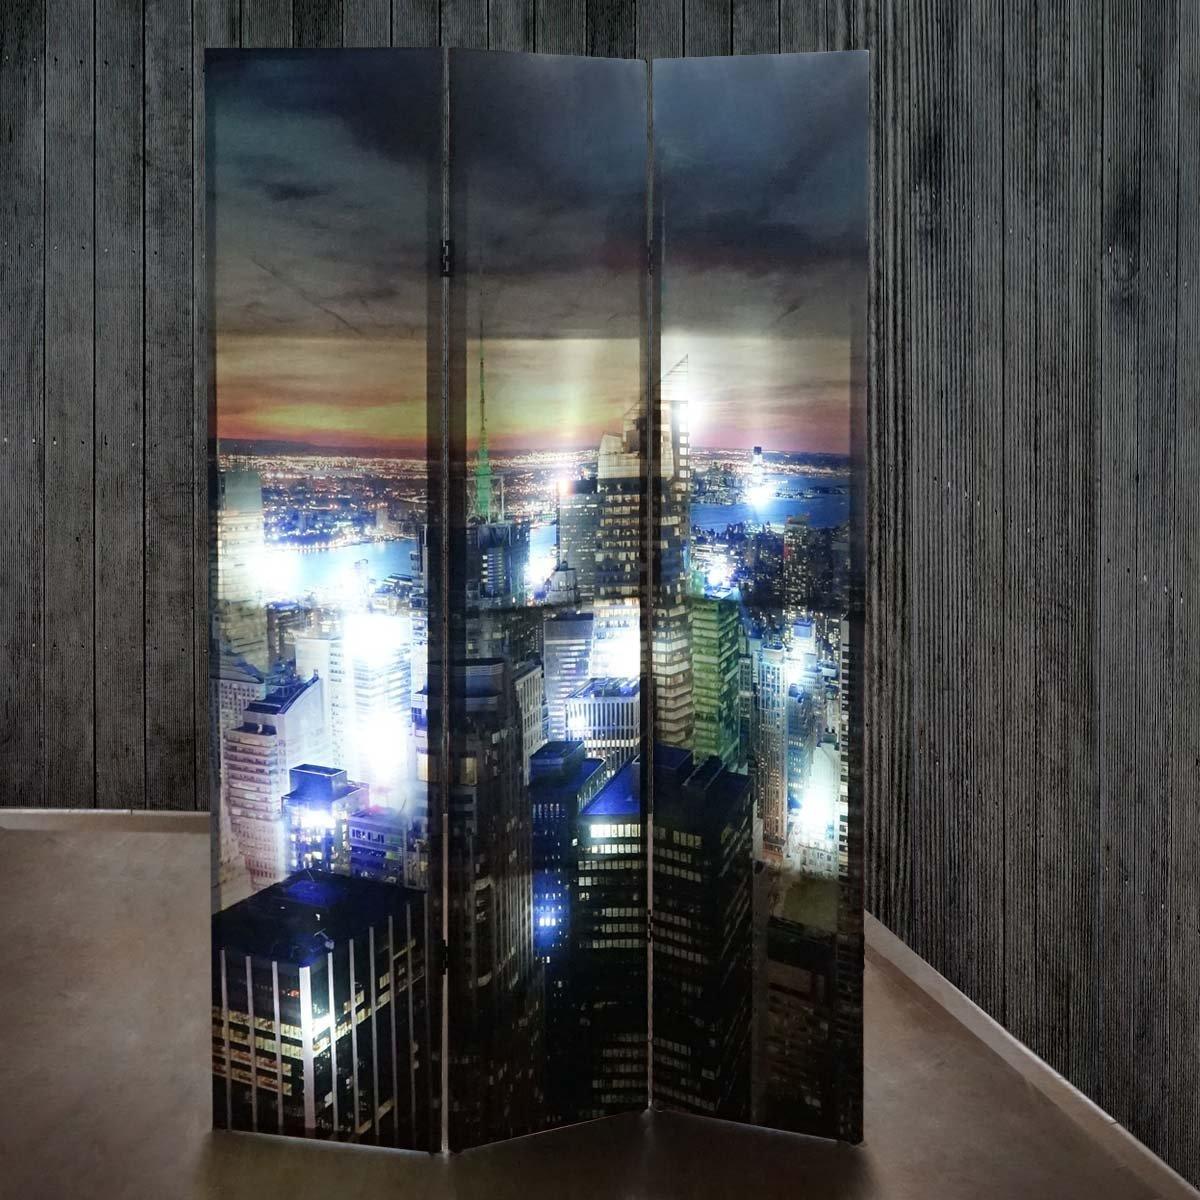 Biombo decorativo new york iluminaci n por 24 led - Iluminacion por leds ...